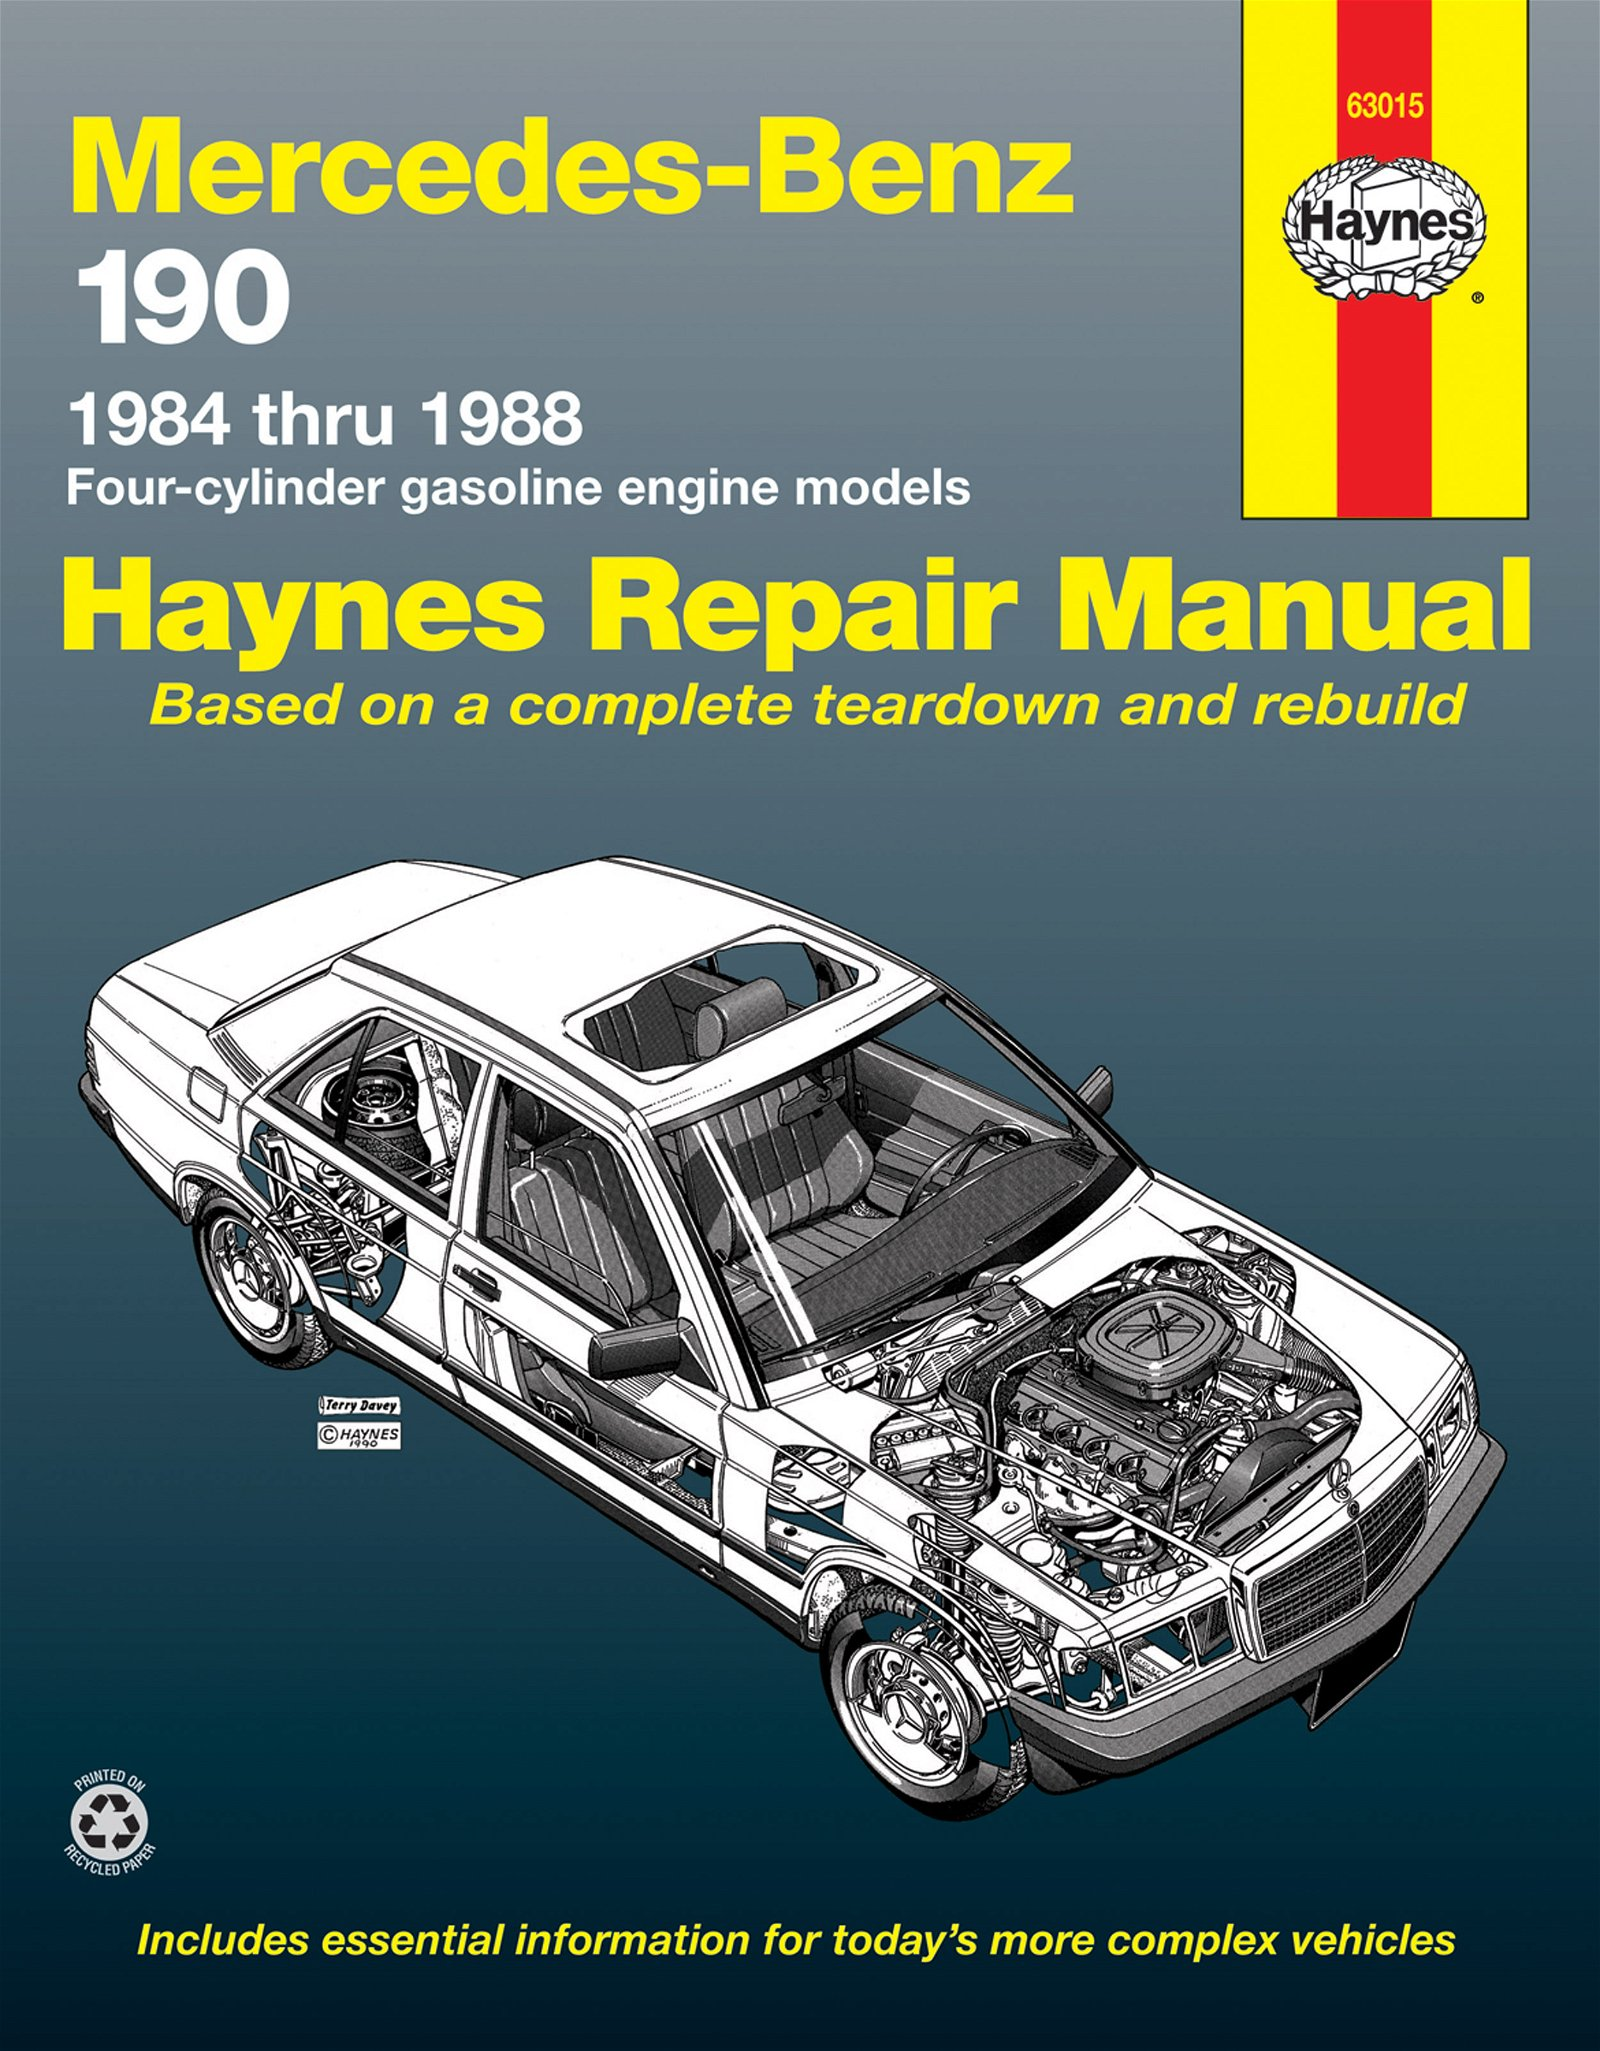 [Manuel US en Anglais] Mercedes-Benz 190 Series  '84 -  '88